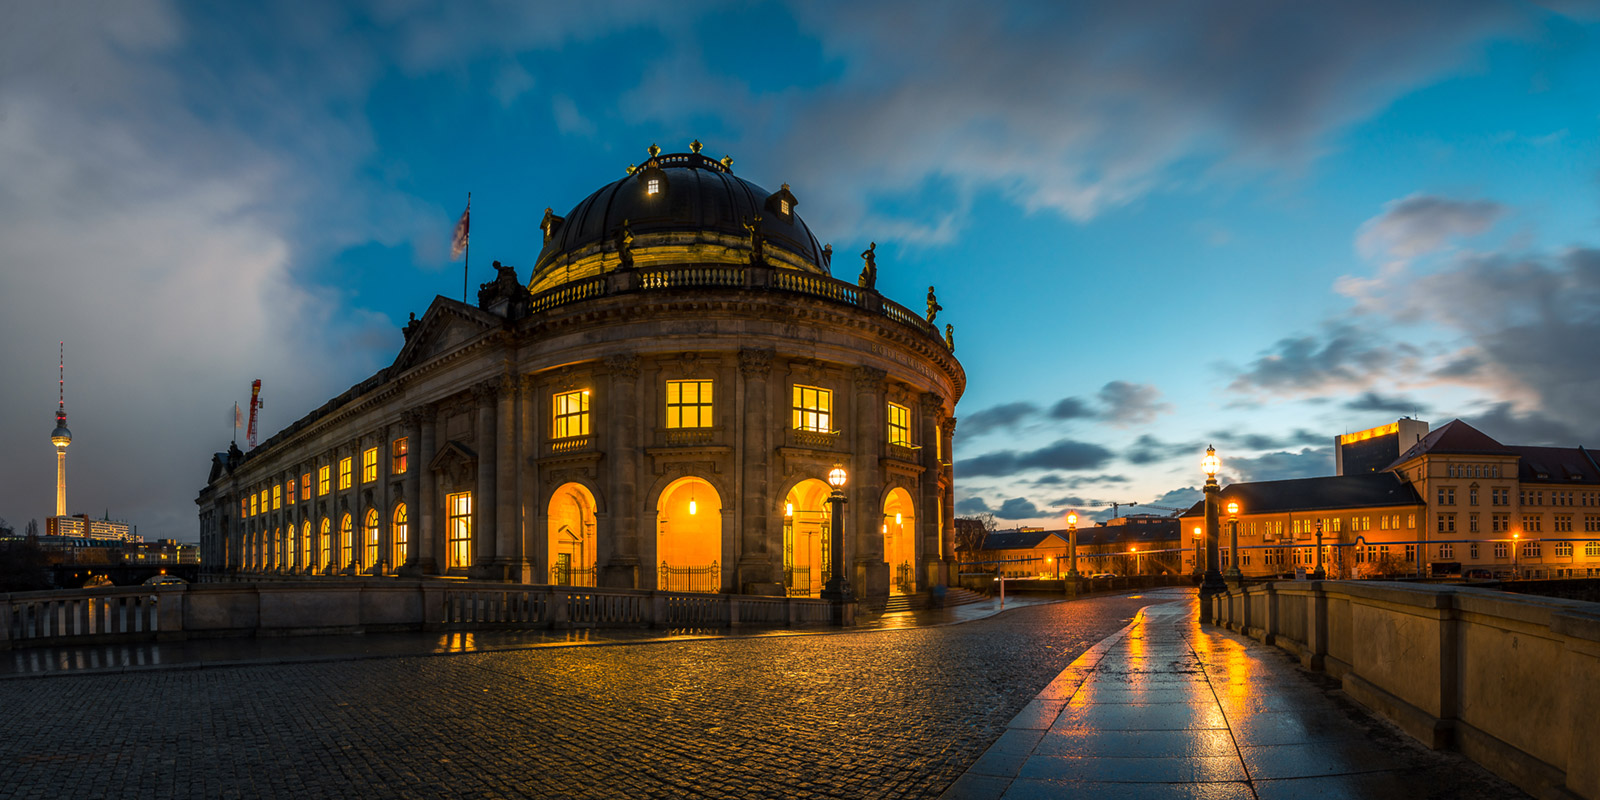 Bodemuseum in Berlin - Stefan Schäfer Landschaftsfotograf